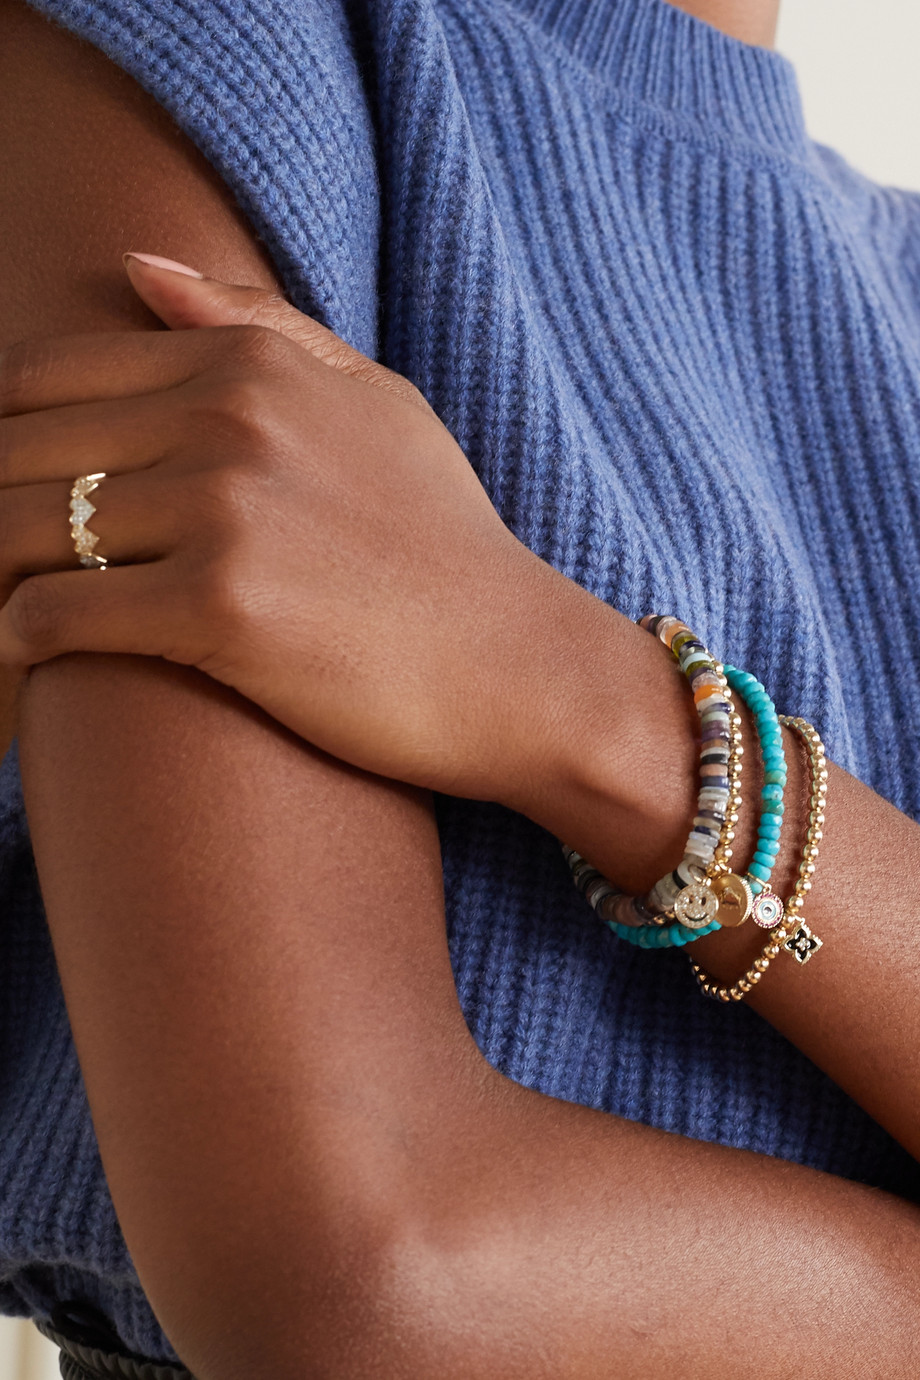 Sydney Evan Happy Face 14-karat gold multi-stone bracelet